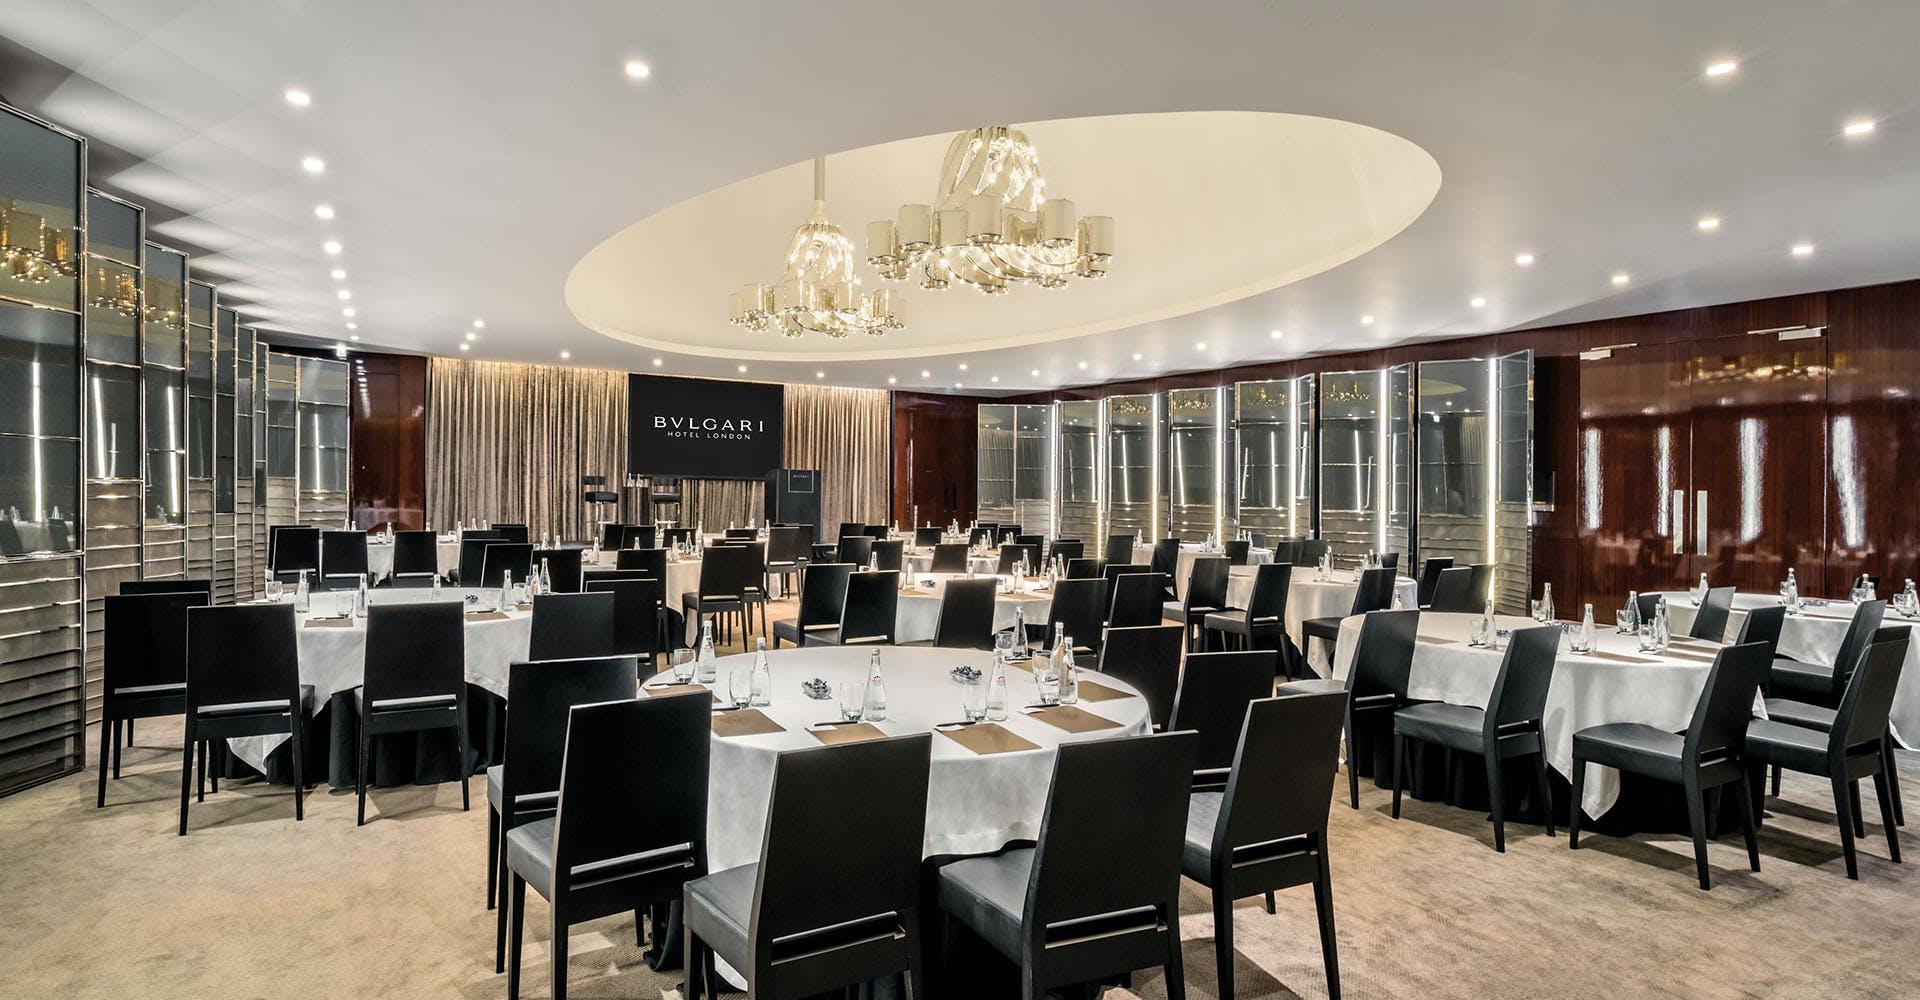 Ballroom Business Bulgari Hotel London